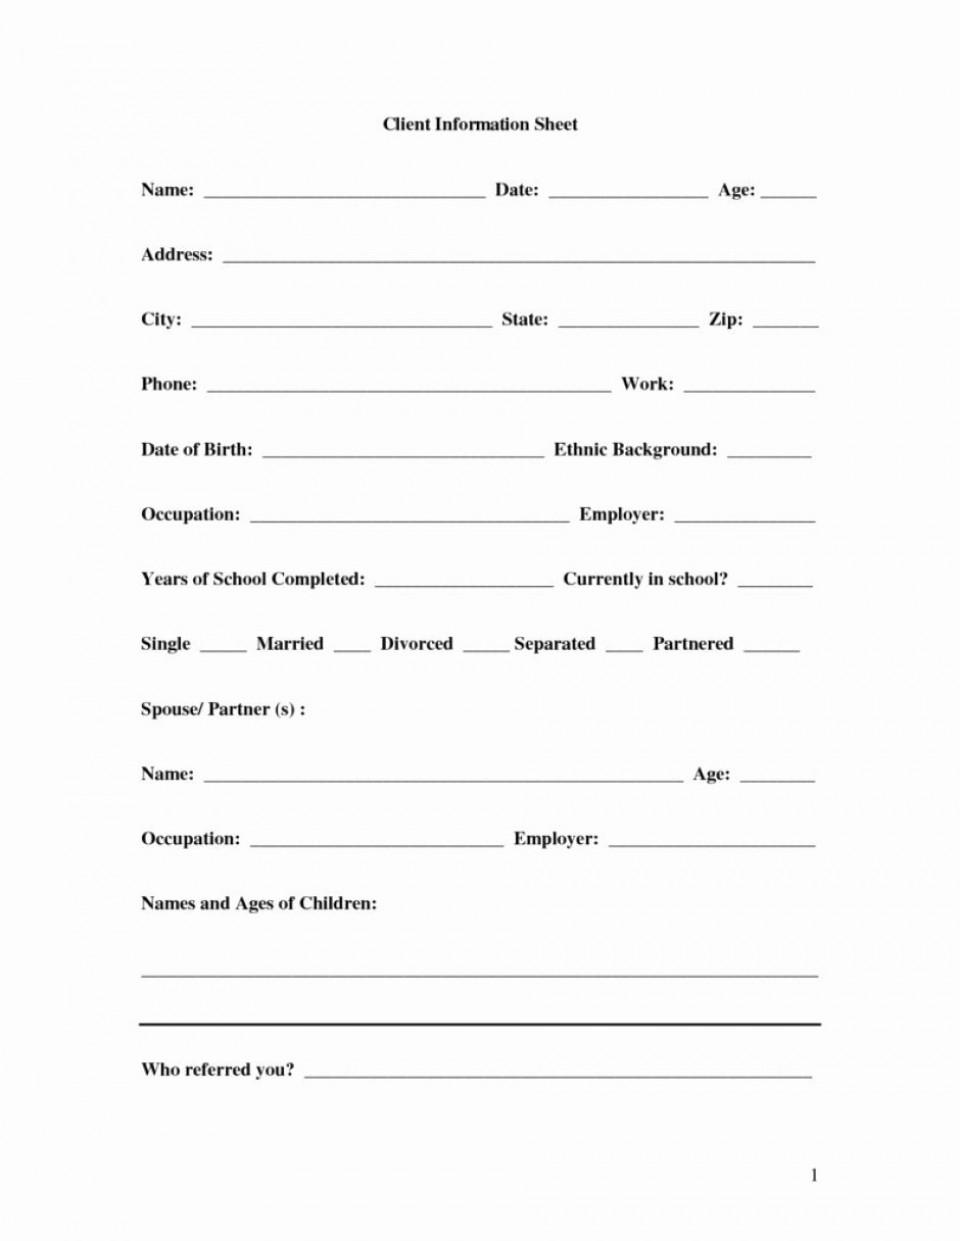 001 Unbelievable Client Information Form Template Excel Highest Clarity 960